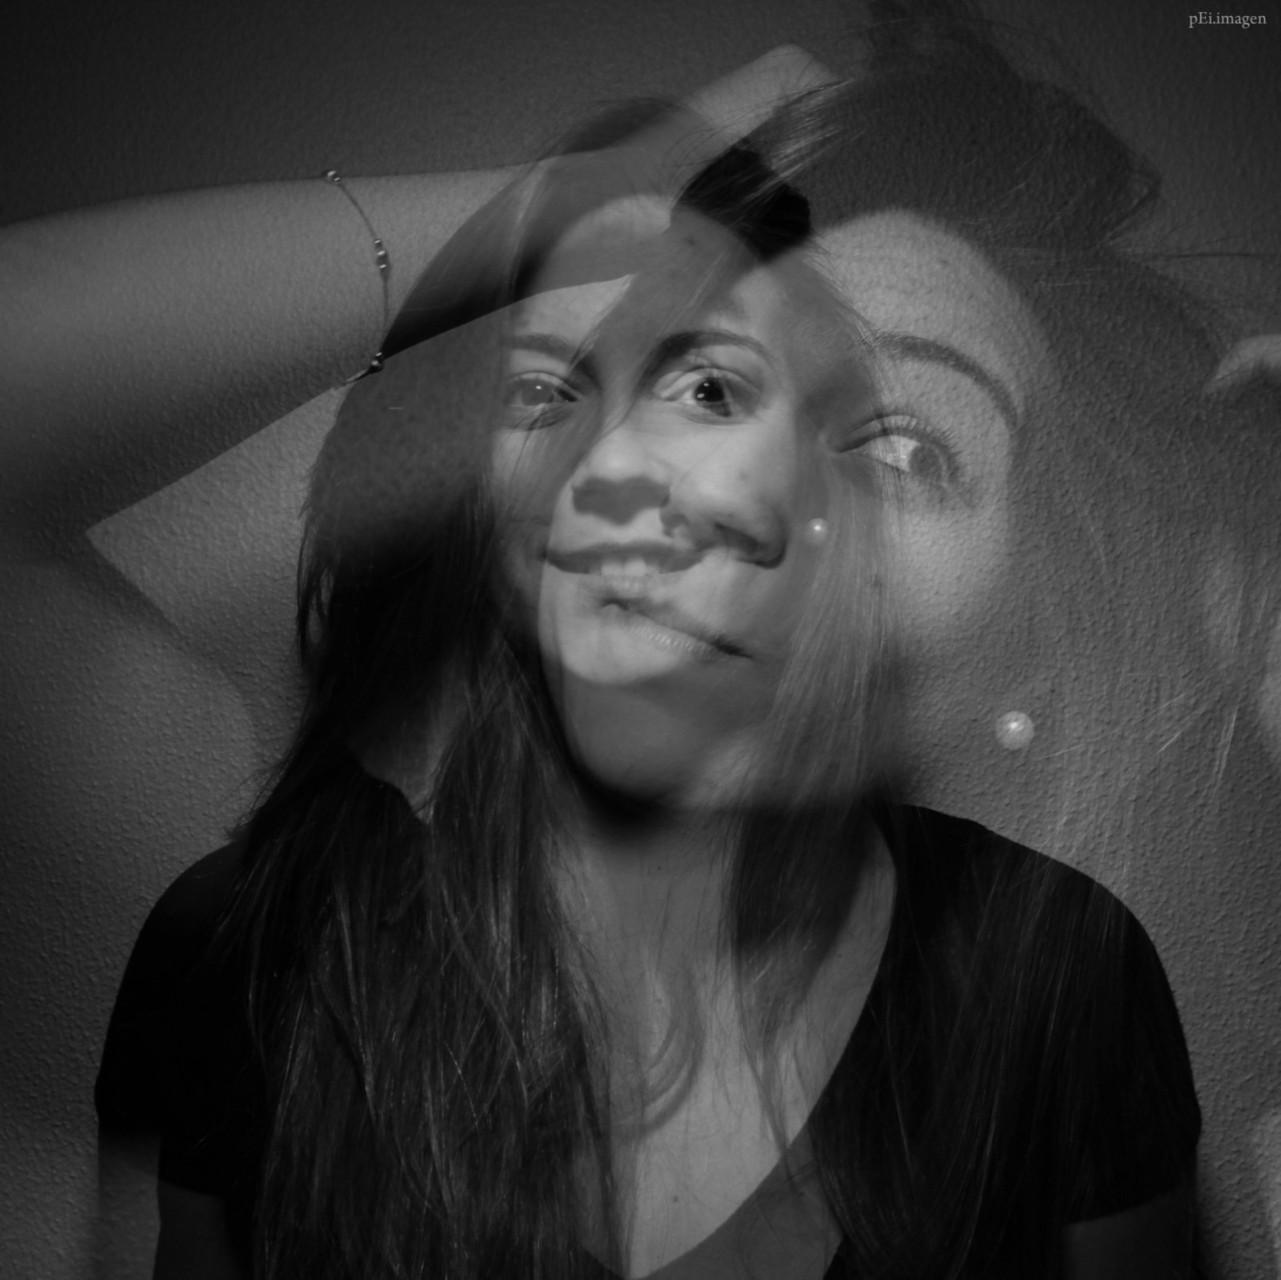 peipegata me myself I proyectos fotografia peipegatafotografia # 109 Andrea Tubio Garcia